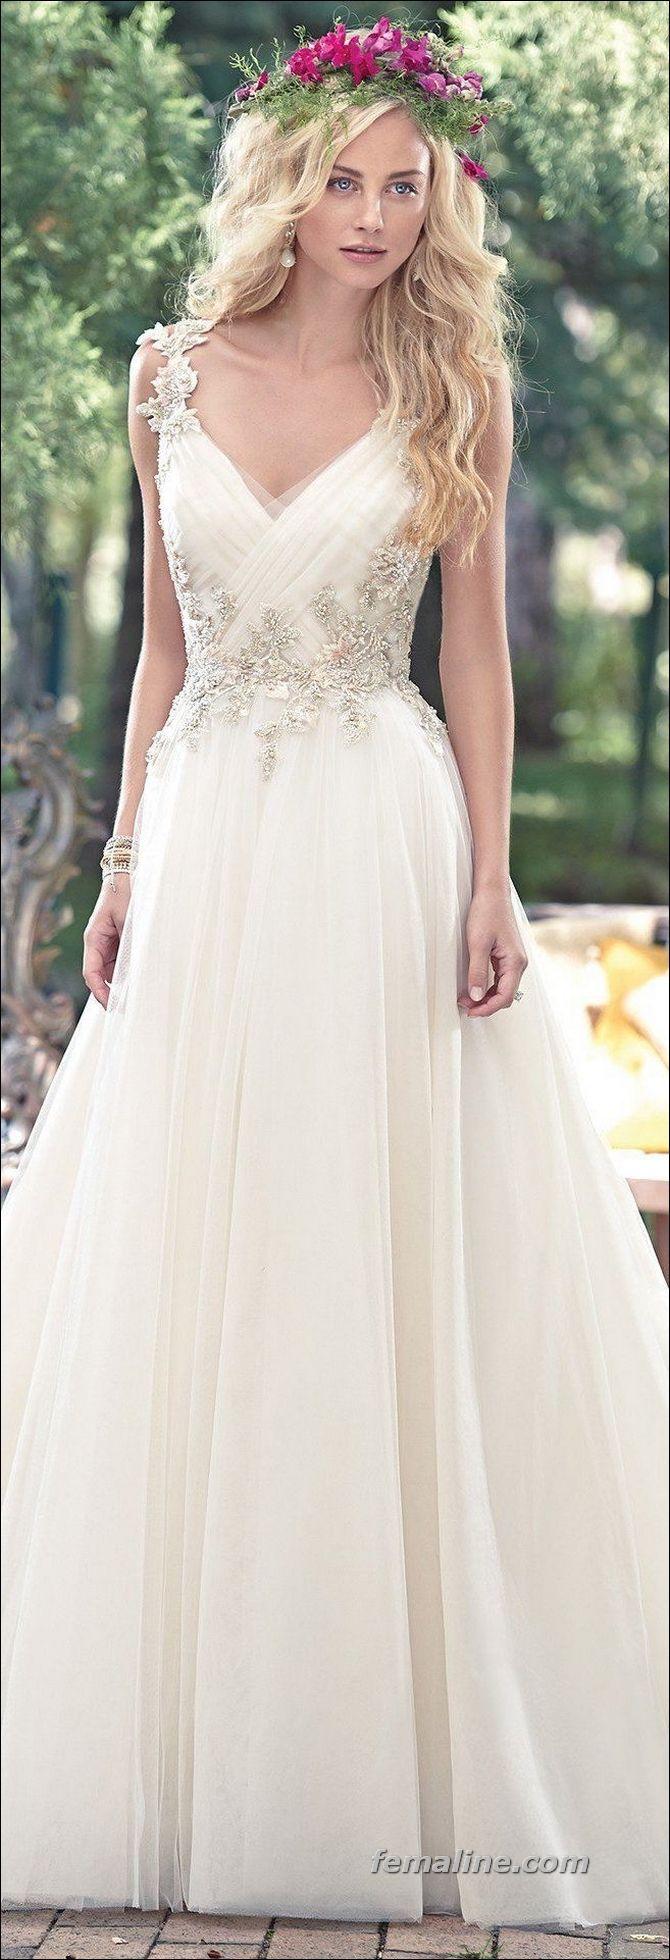 187 Ideas For Spring Wedding Dresses 2017